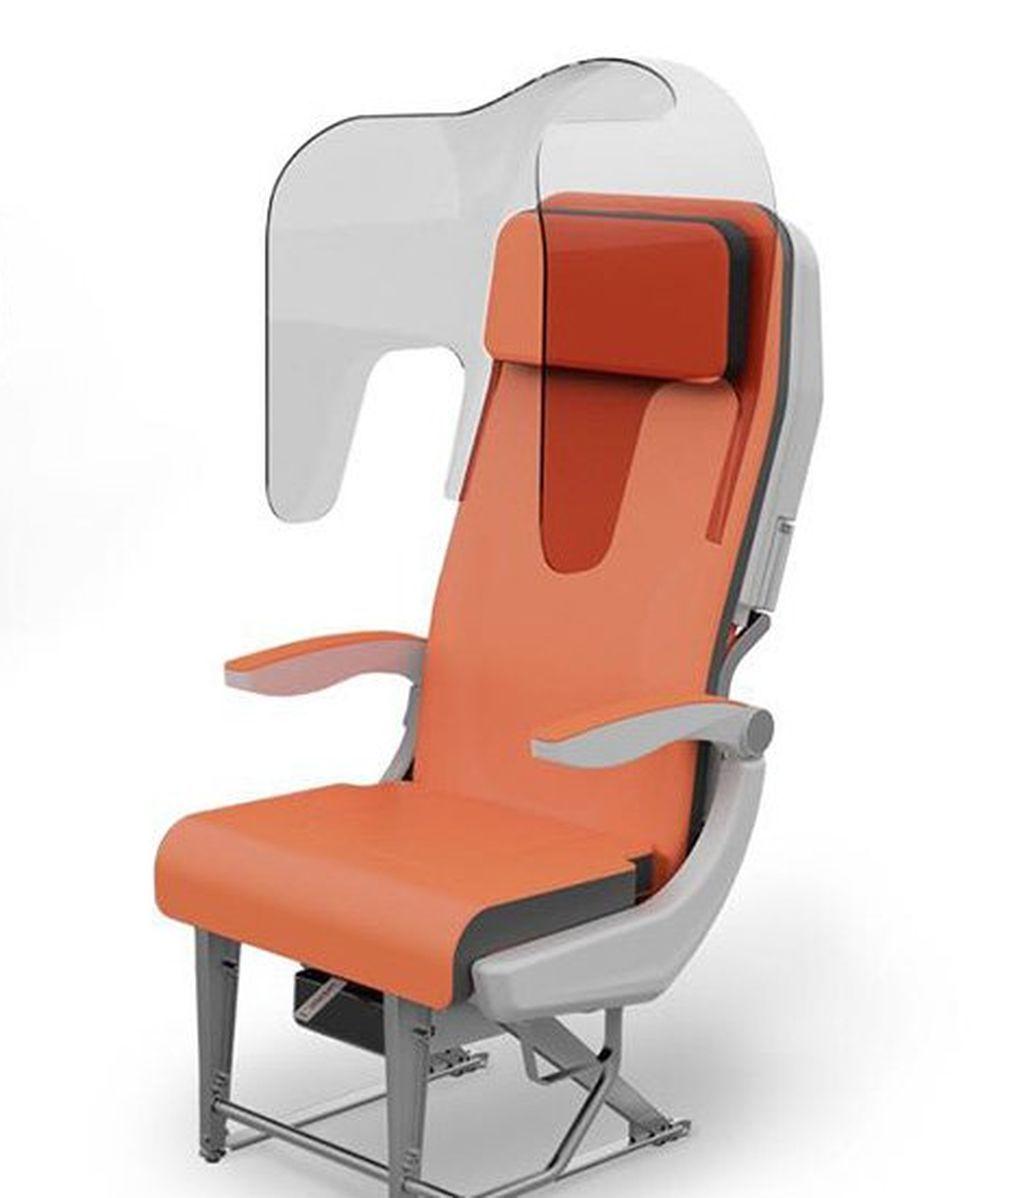 Avio-interiors 3